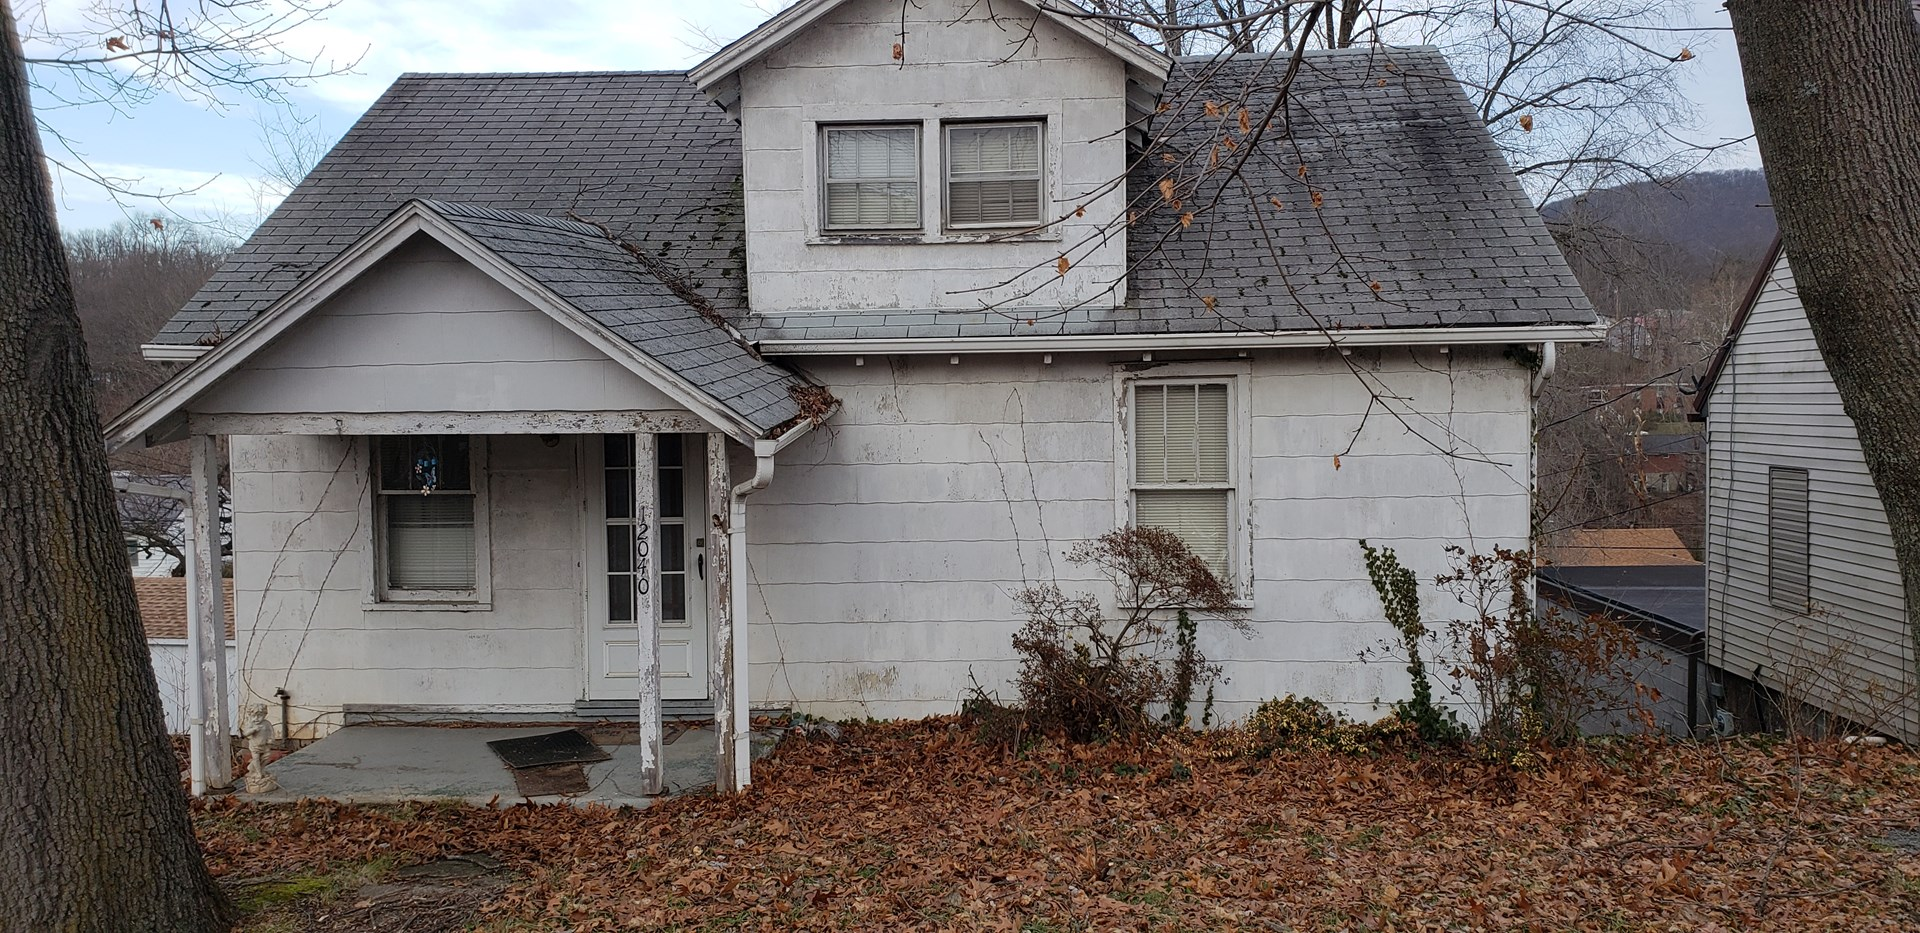 Home for Sale near Cresaptown MD